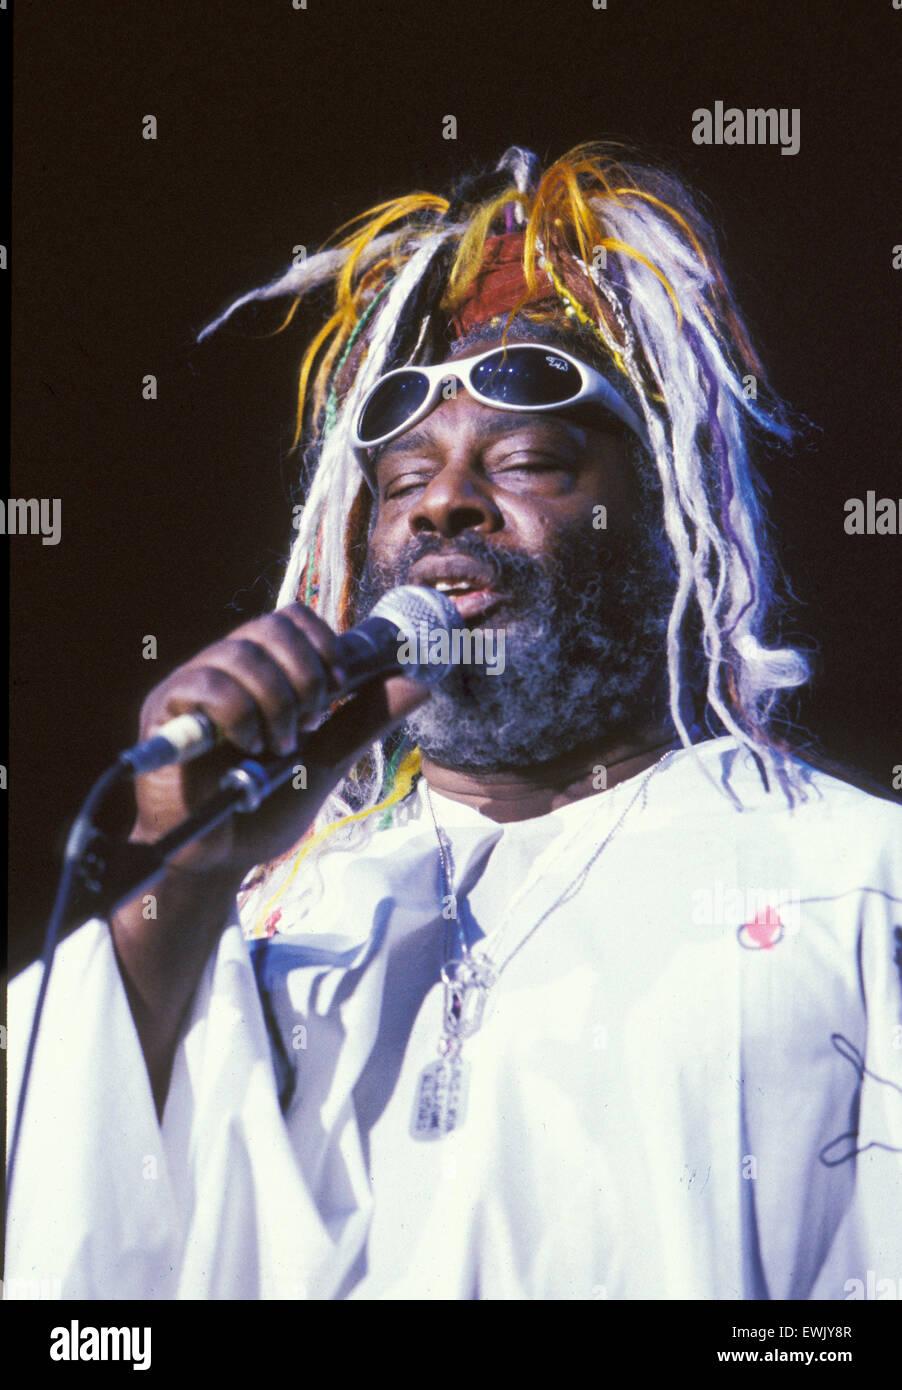 GEORGE CLINTON U.S. Sänger im Jahr 1998 Stockbild